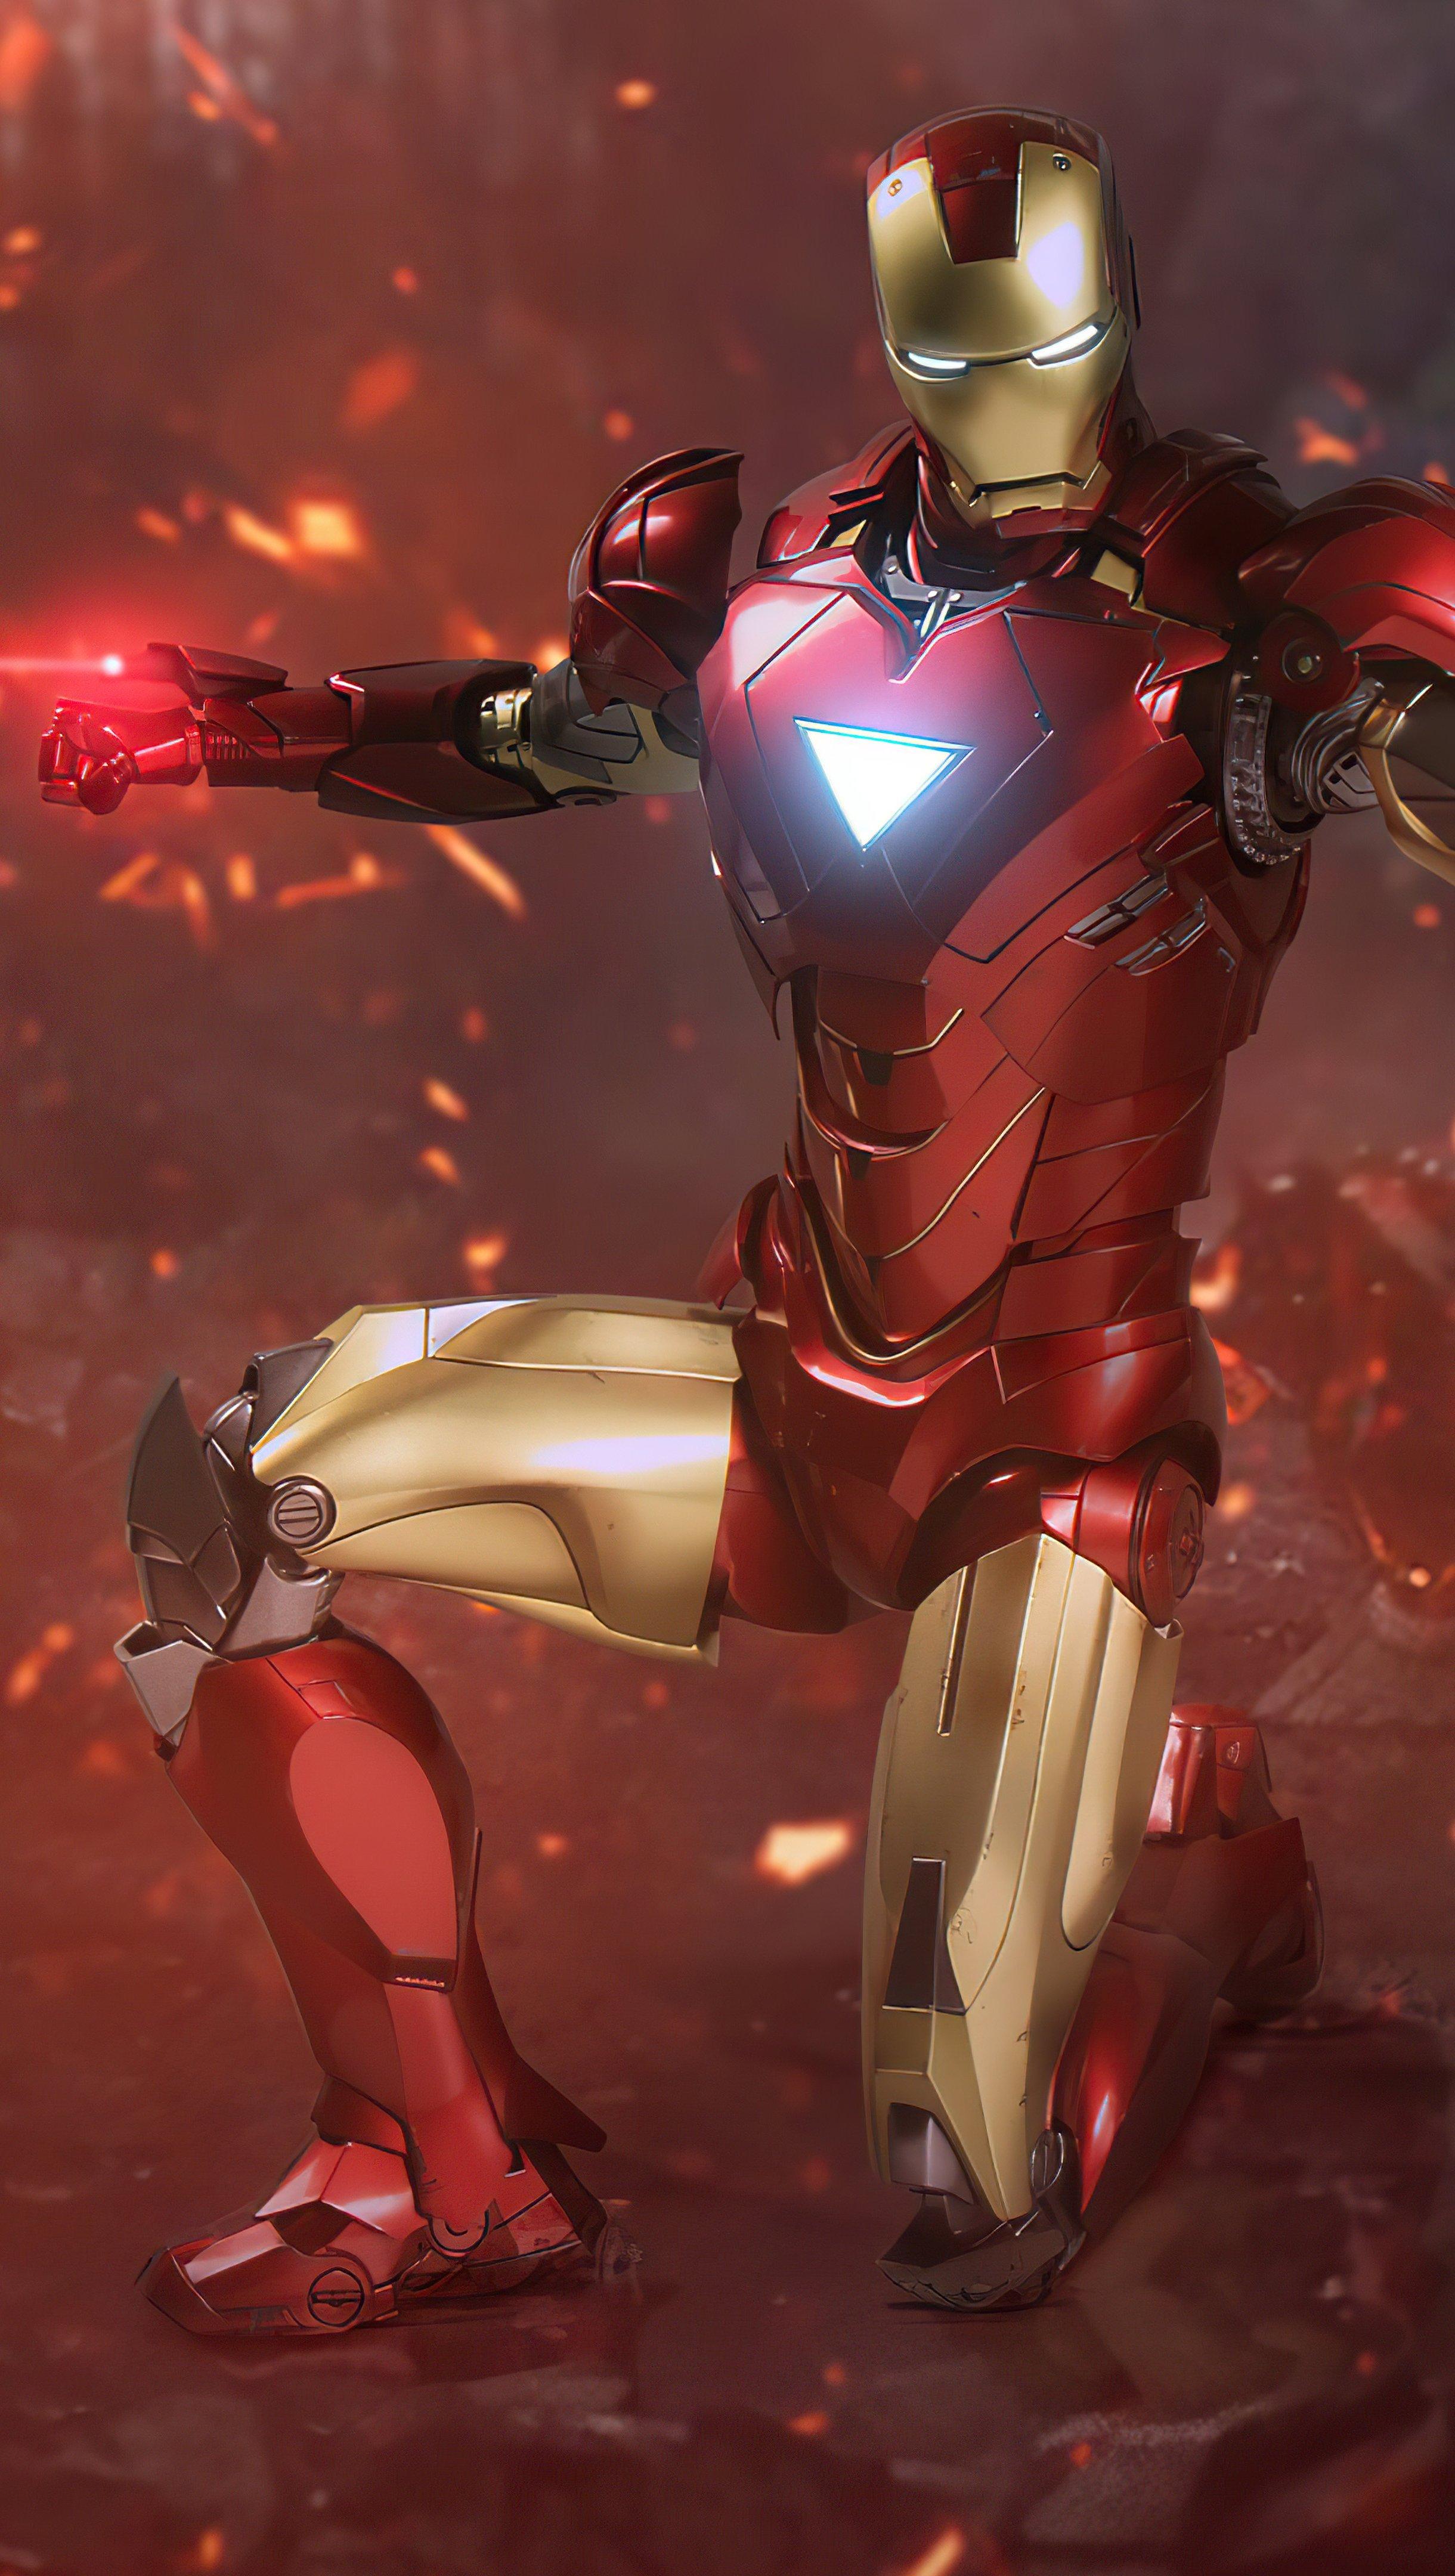 Wallpaper Iron Man attacking Vertical